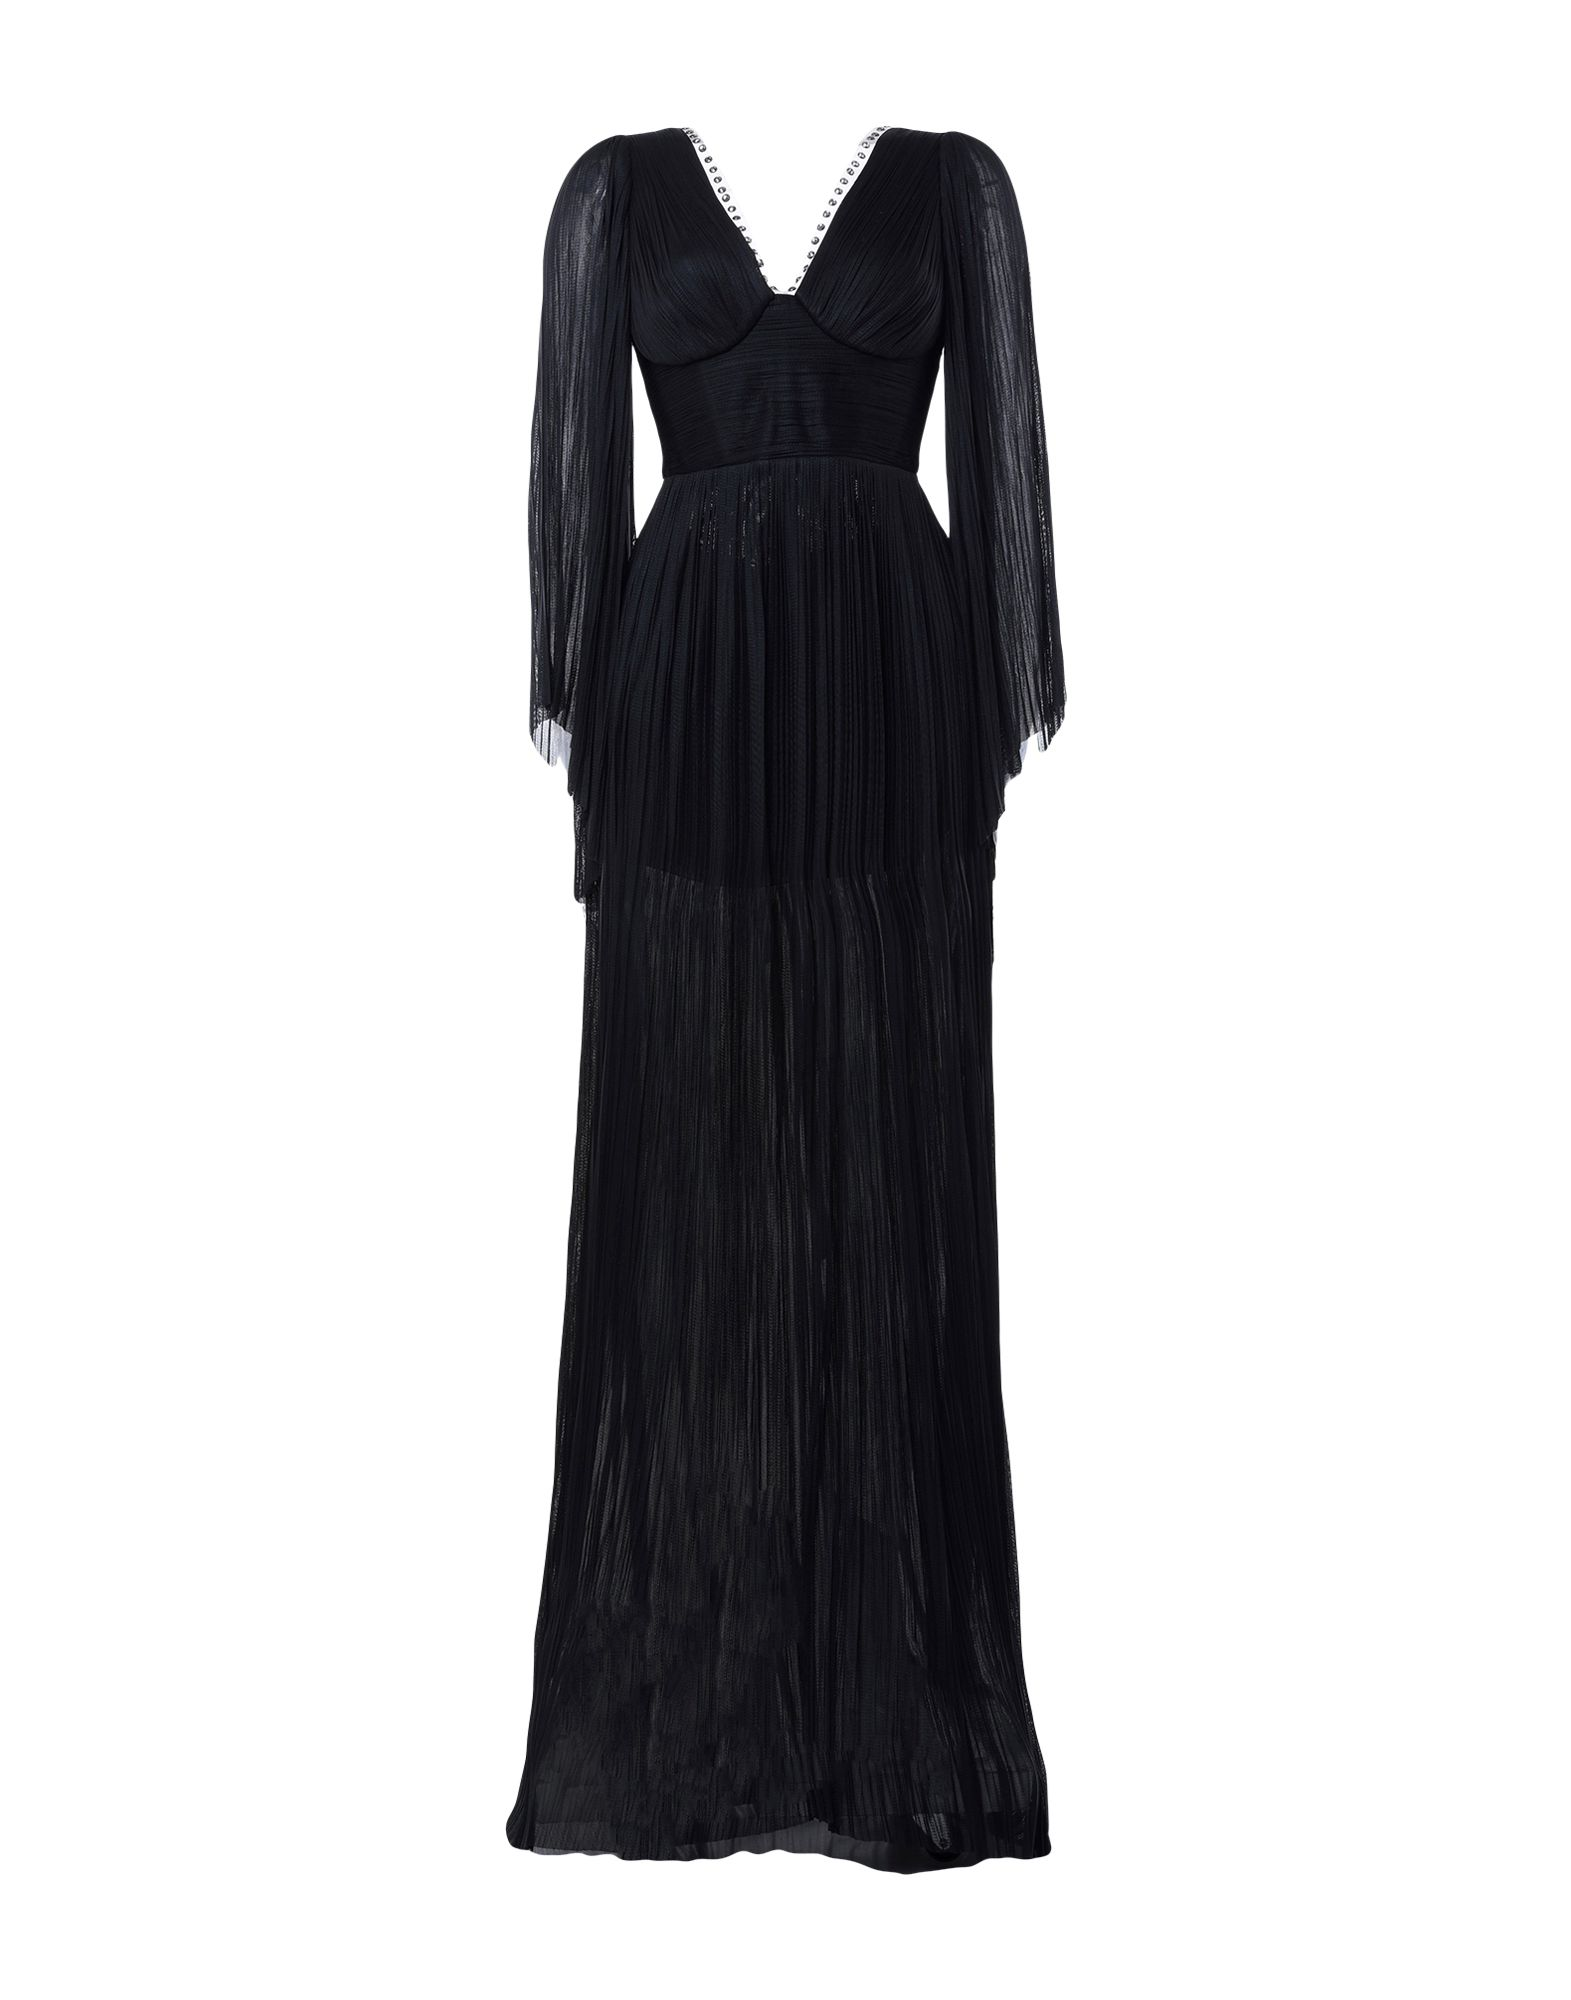 Фото - MARIA LUCIA HOHAN Длинное платье платье maria rybalchenko maria rybalchenko mp002xw1hk4t